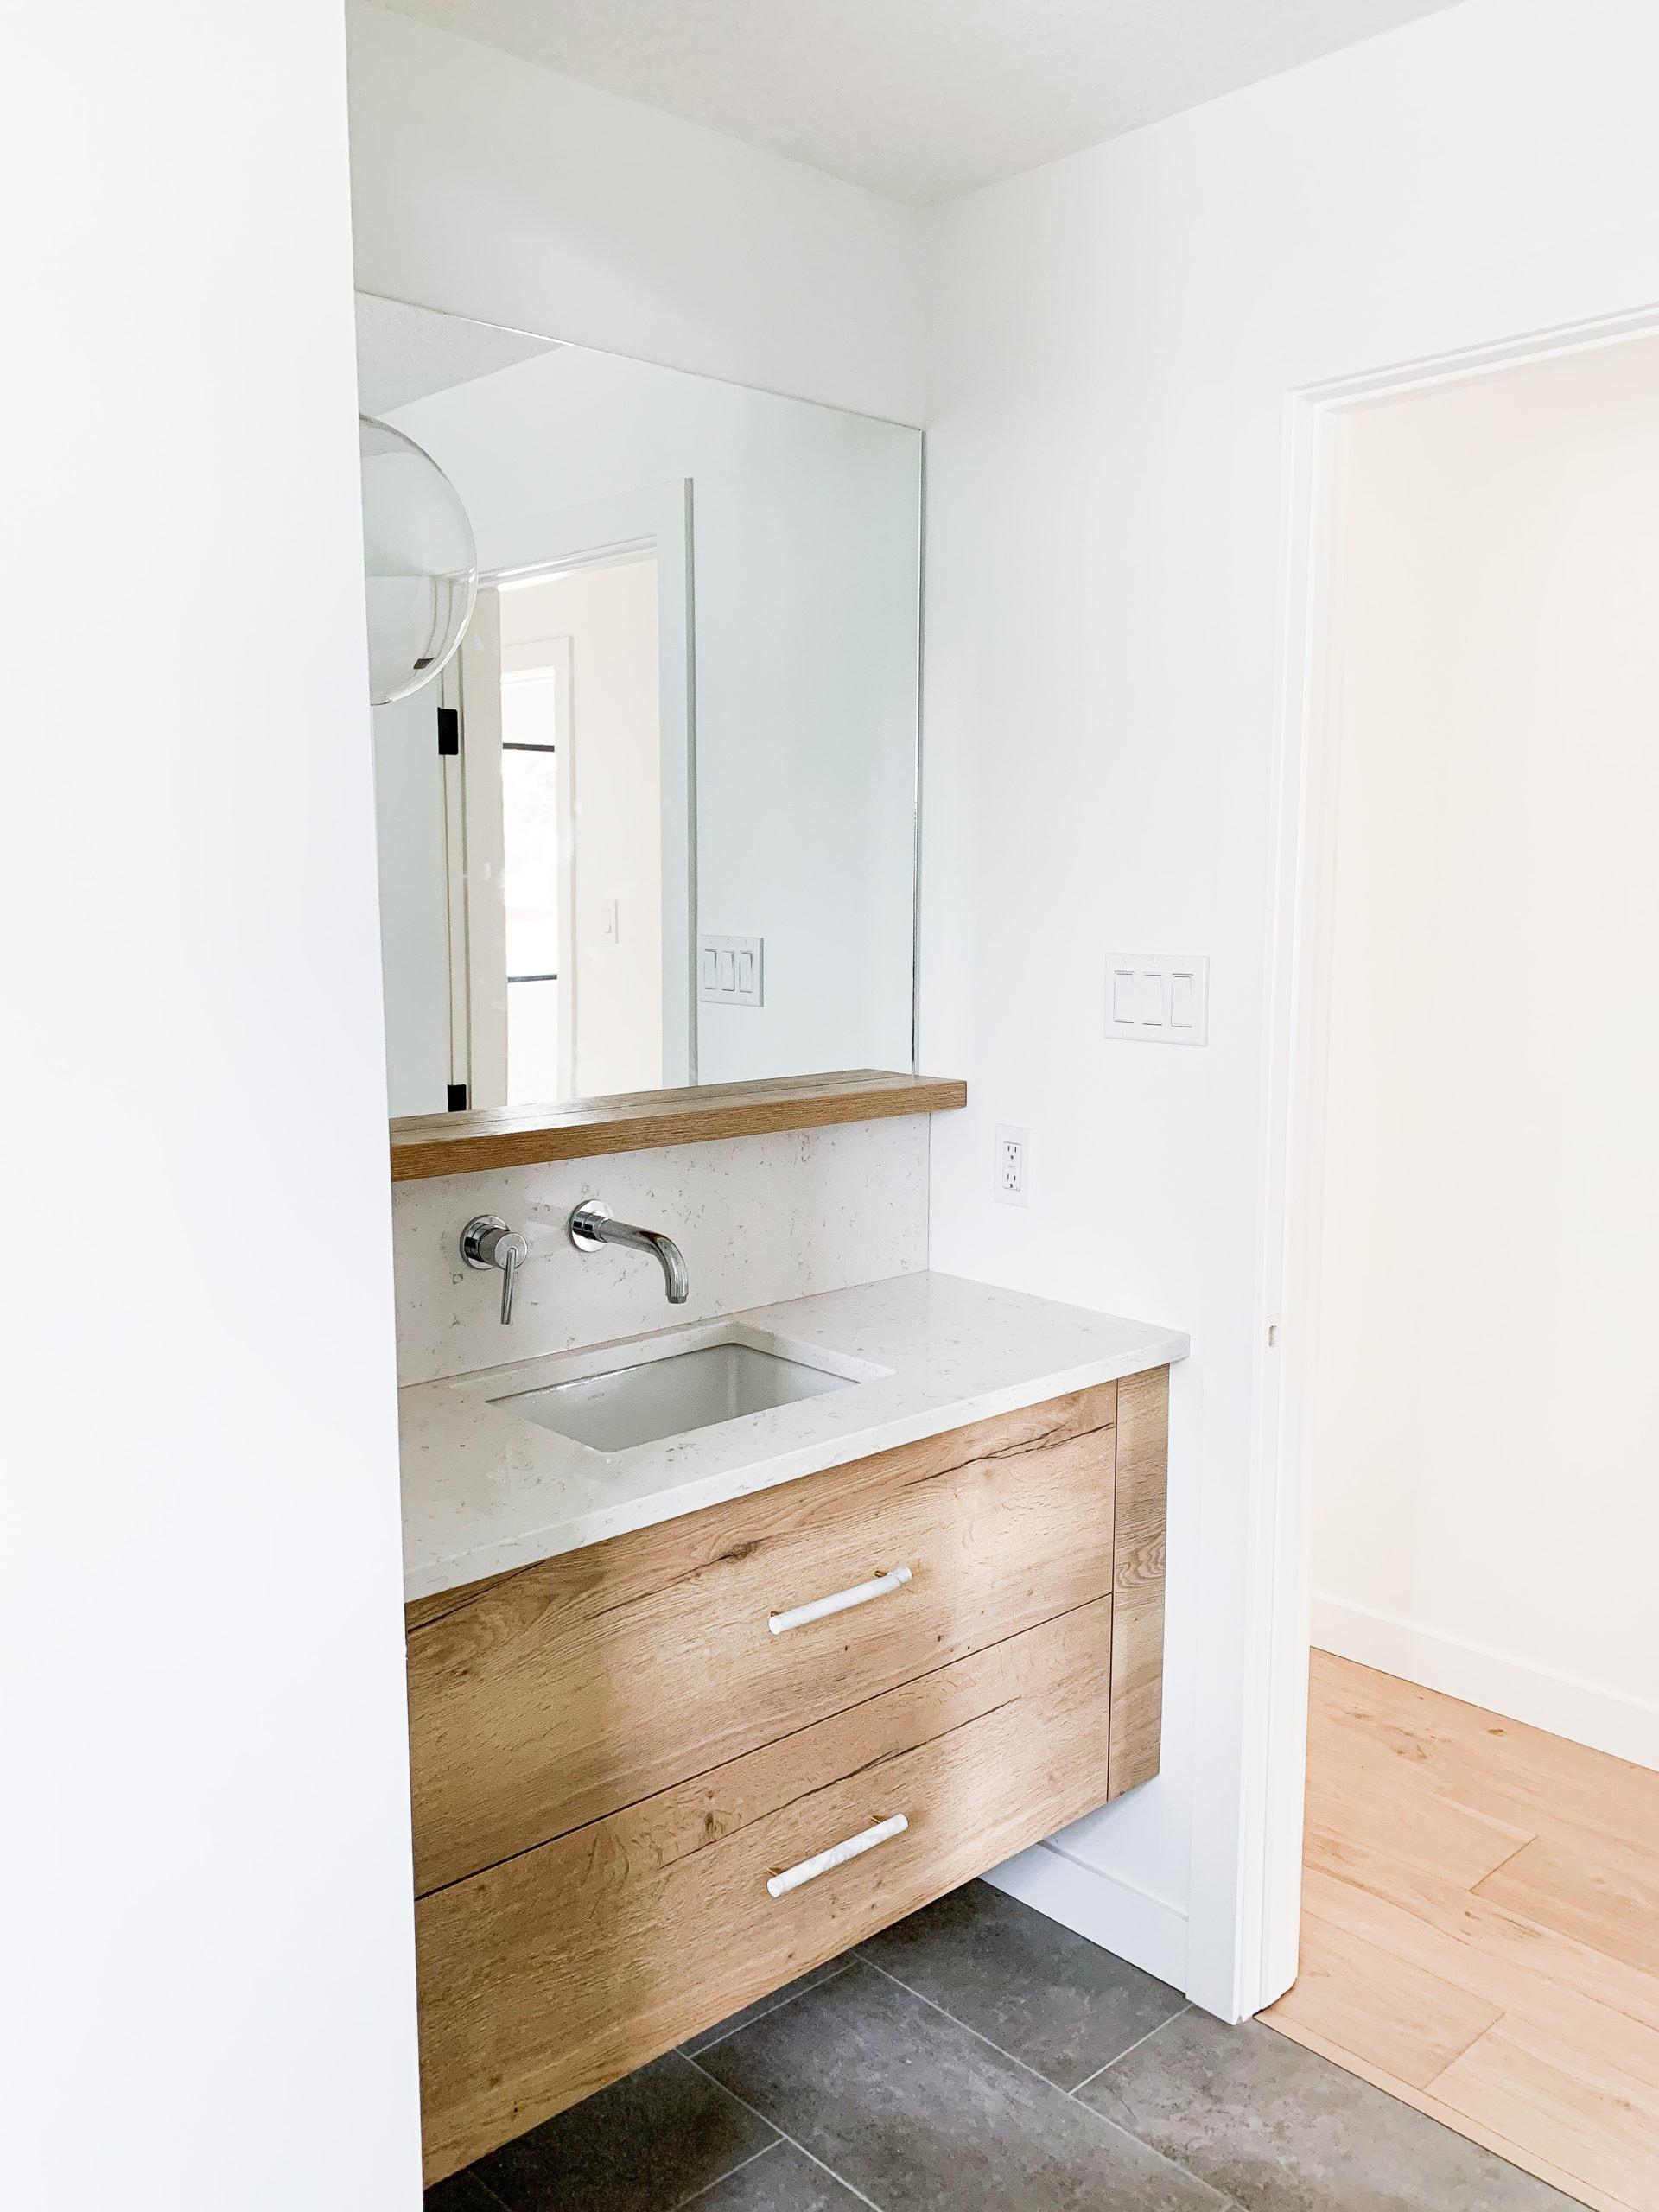 Full Home Renovation - Earthy Coastal Scandinavian California Minimal Powder Room Remodel